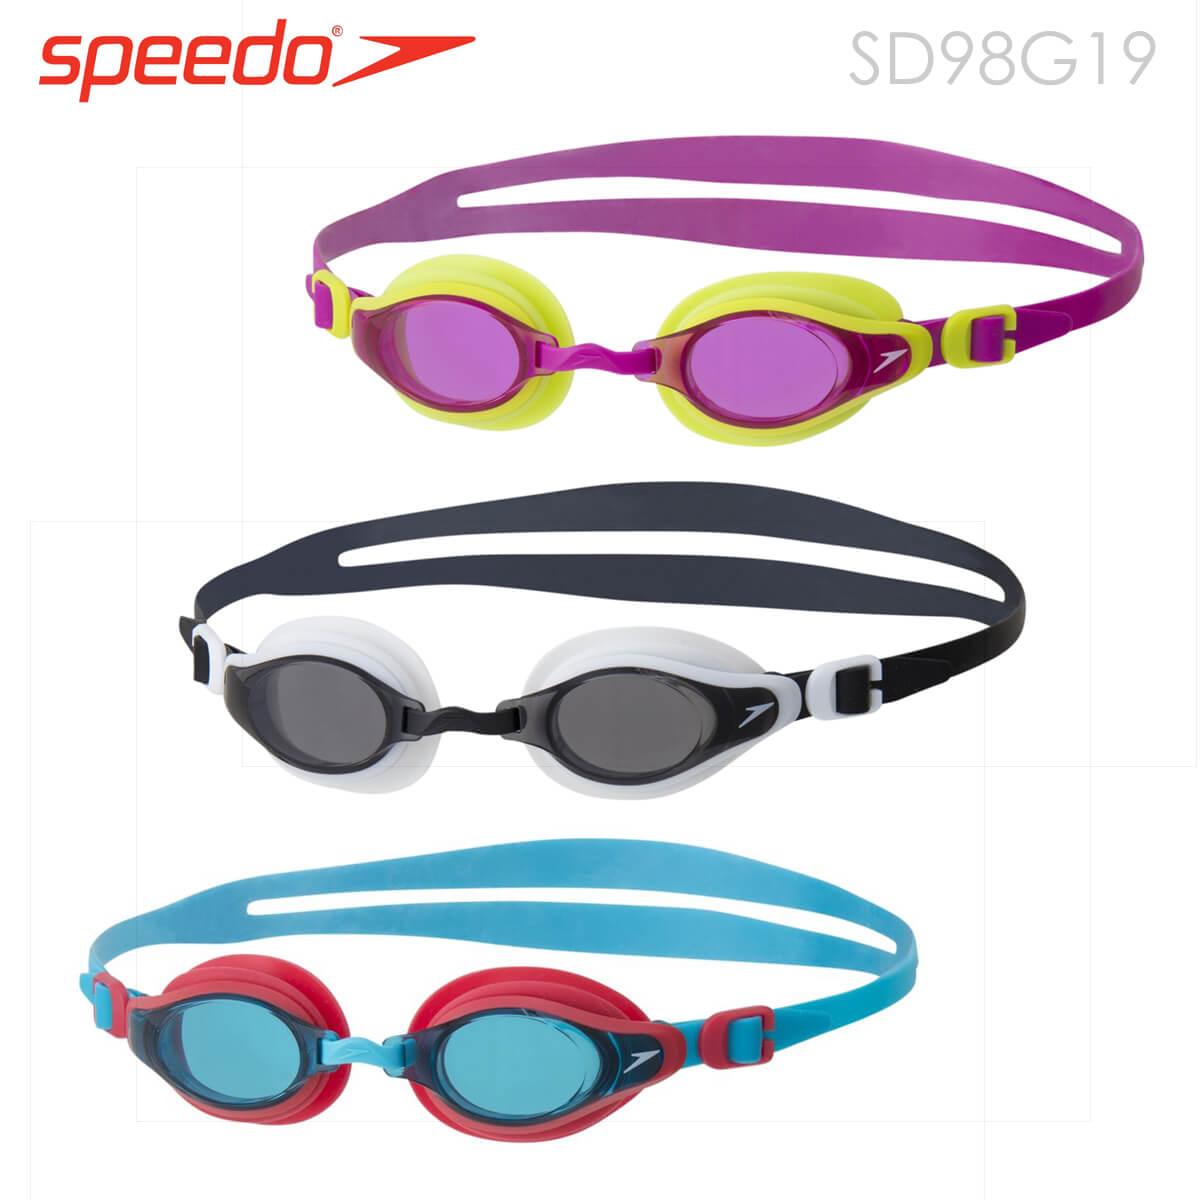 SPEEDO SD98G19 スイム ゴーグル・レンズ マリナースプリームジュニア スピード18SS【取り寄せ】